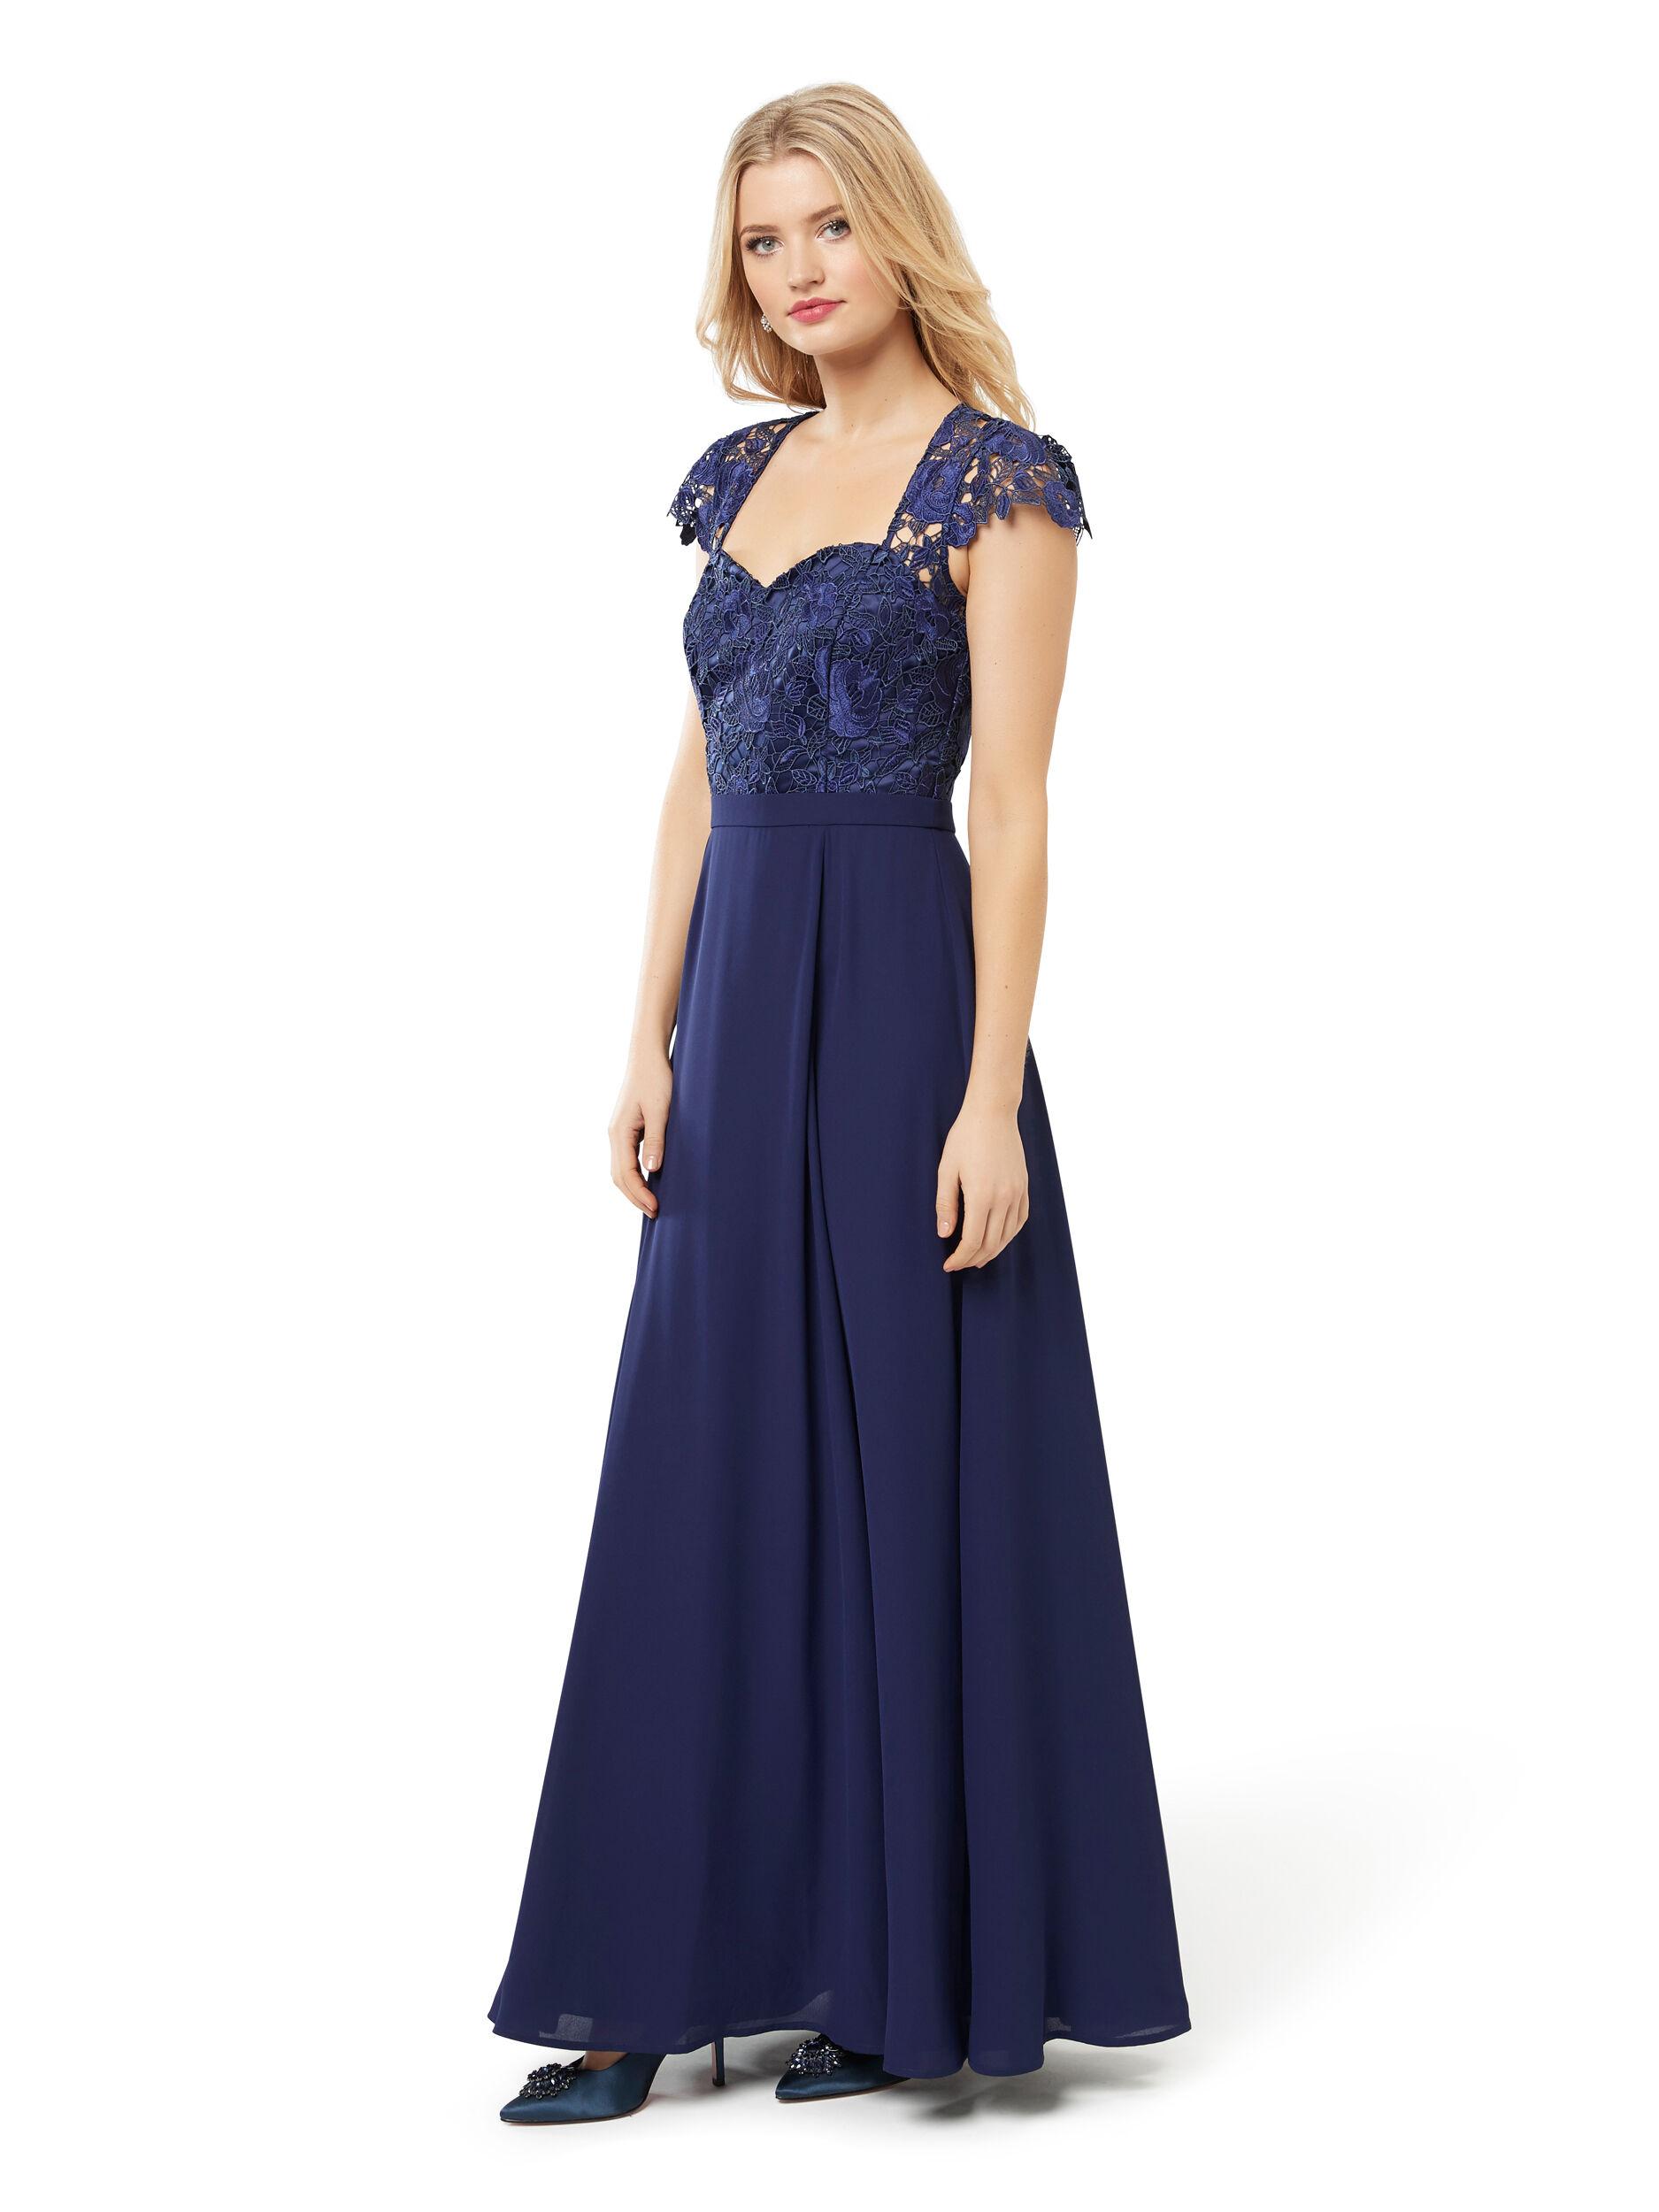 Devotion Maxi Dress